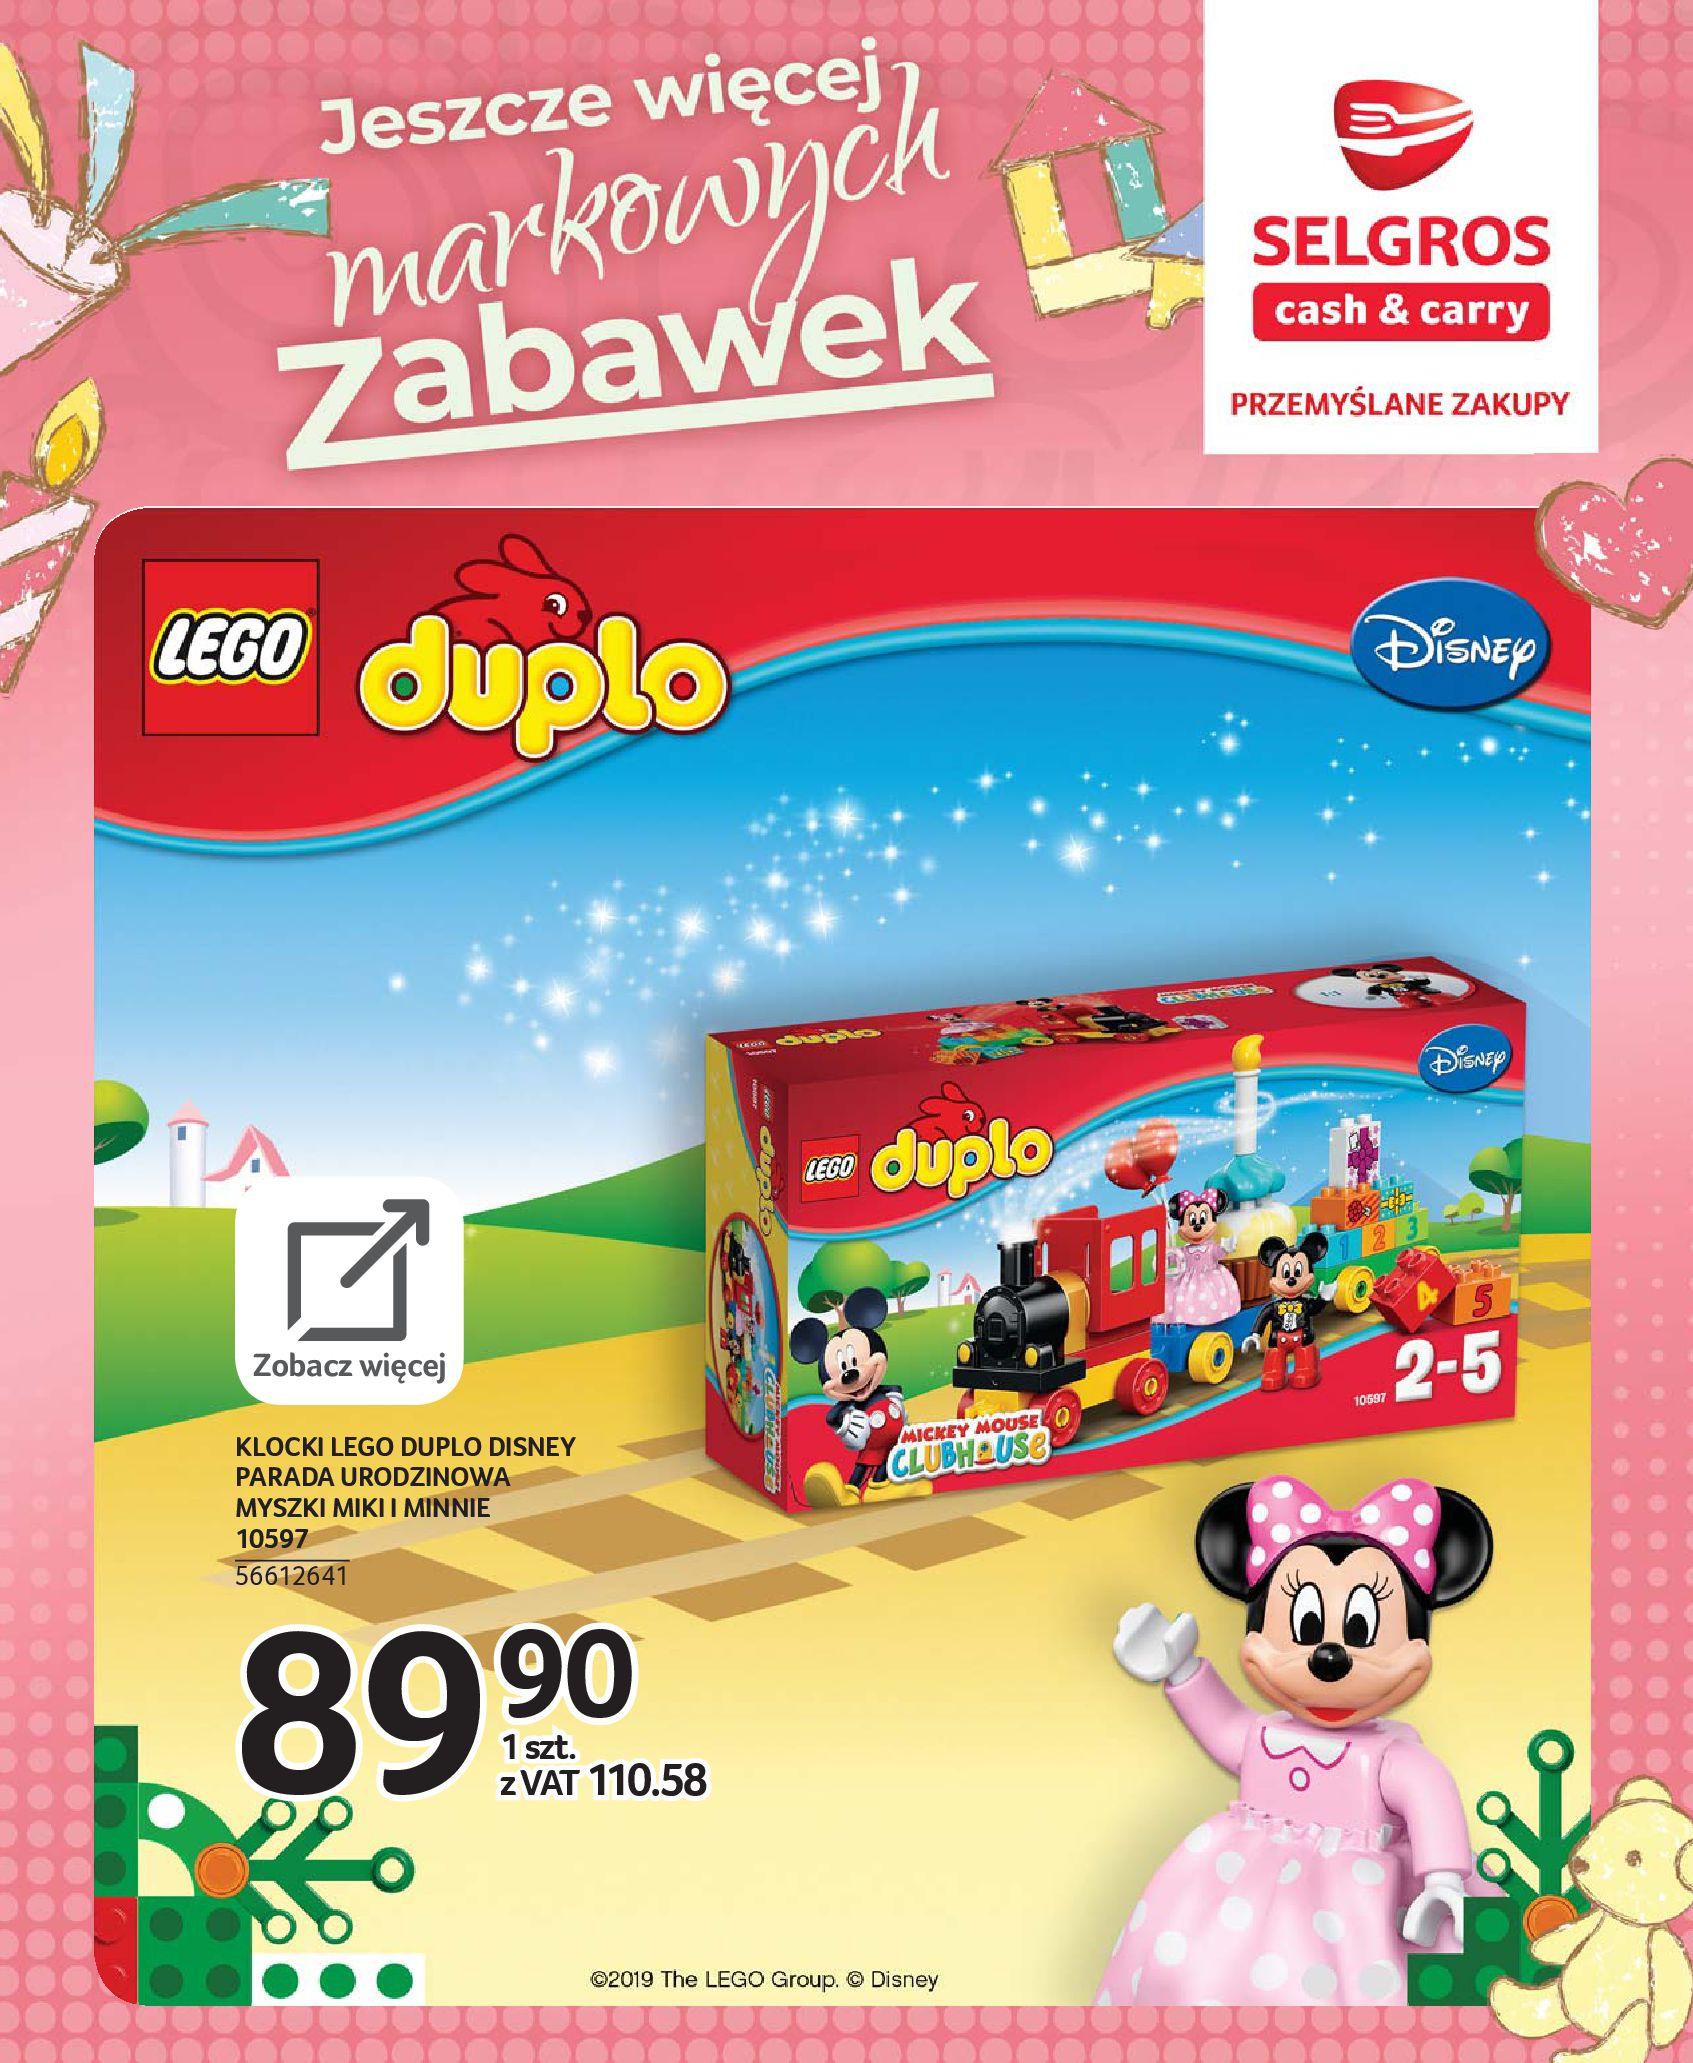 Gazetka Selgros - Katalog zabawek-20.11.2019-24.12.2019-page-70